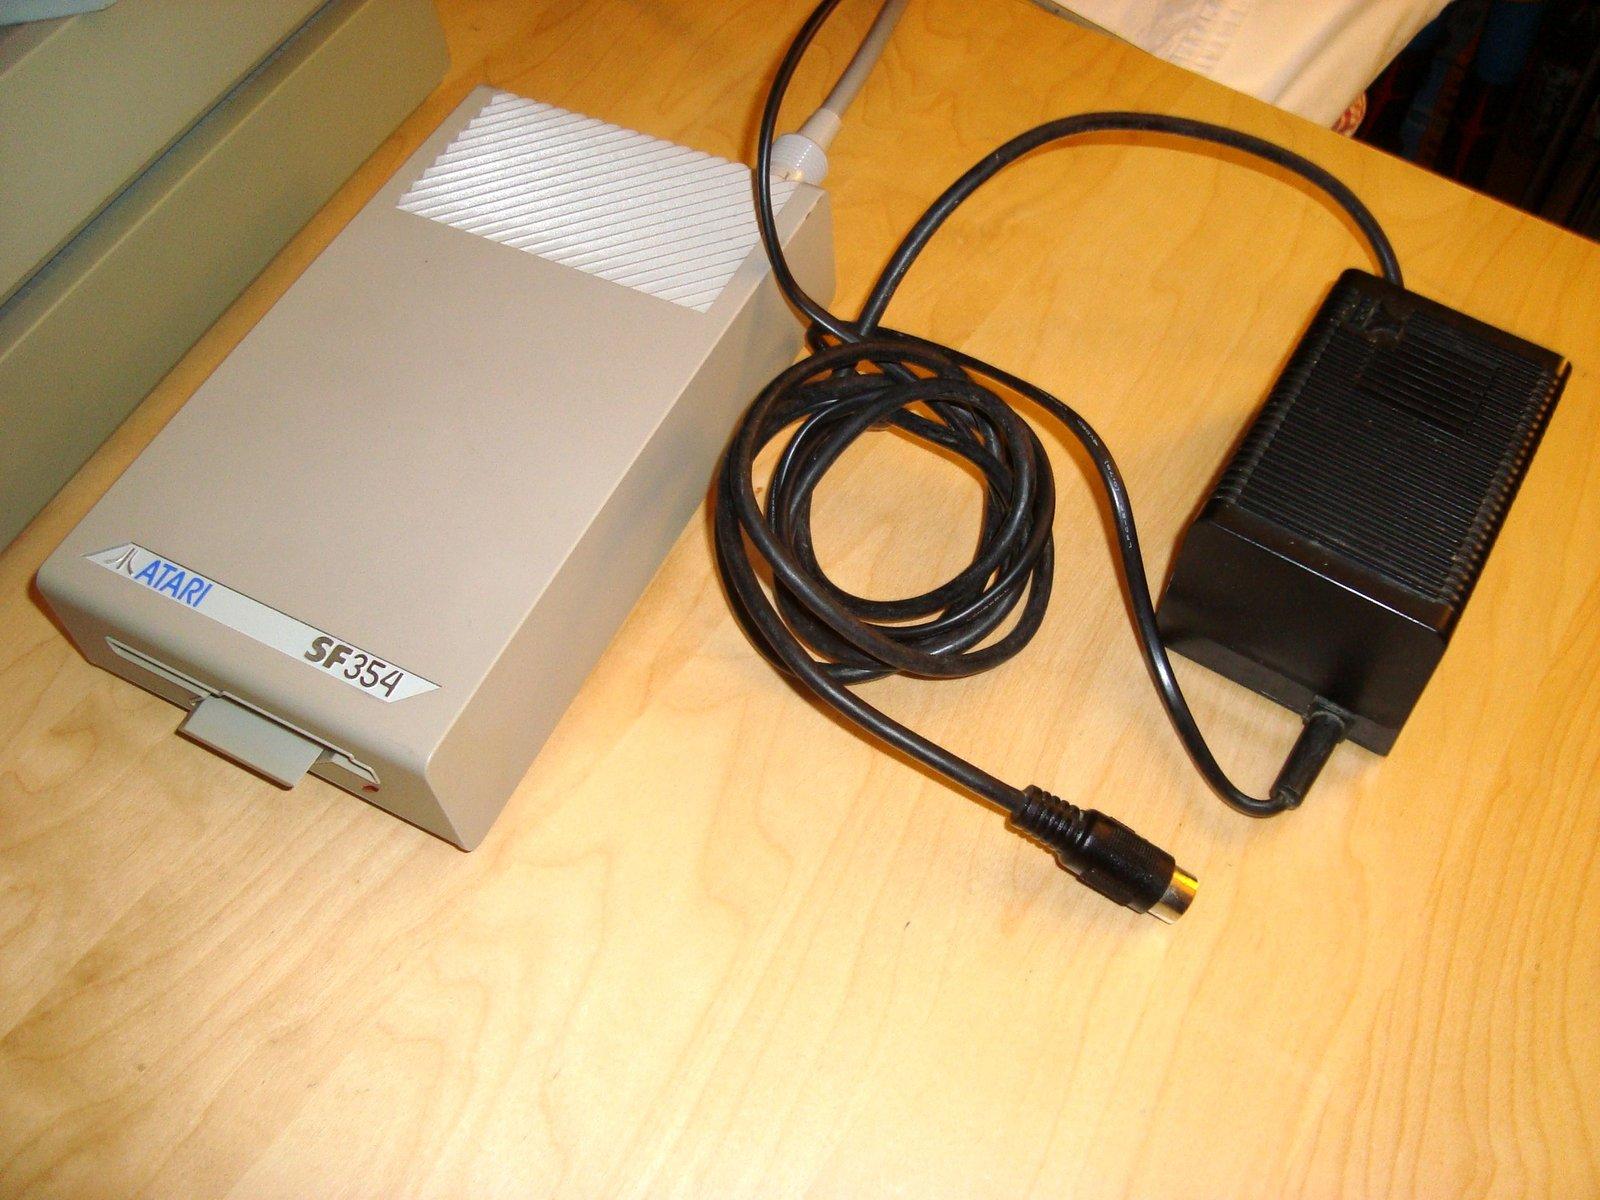 [TEST] Lecteurs disquettes externes SF354/SF314 - Atari ST 201015110421523801